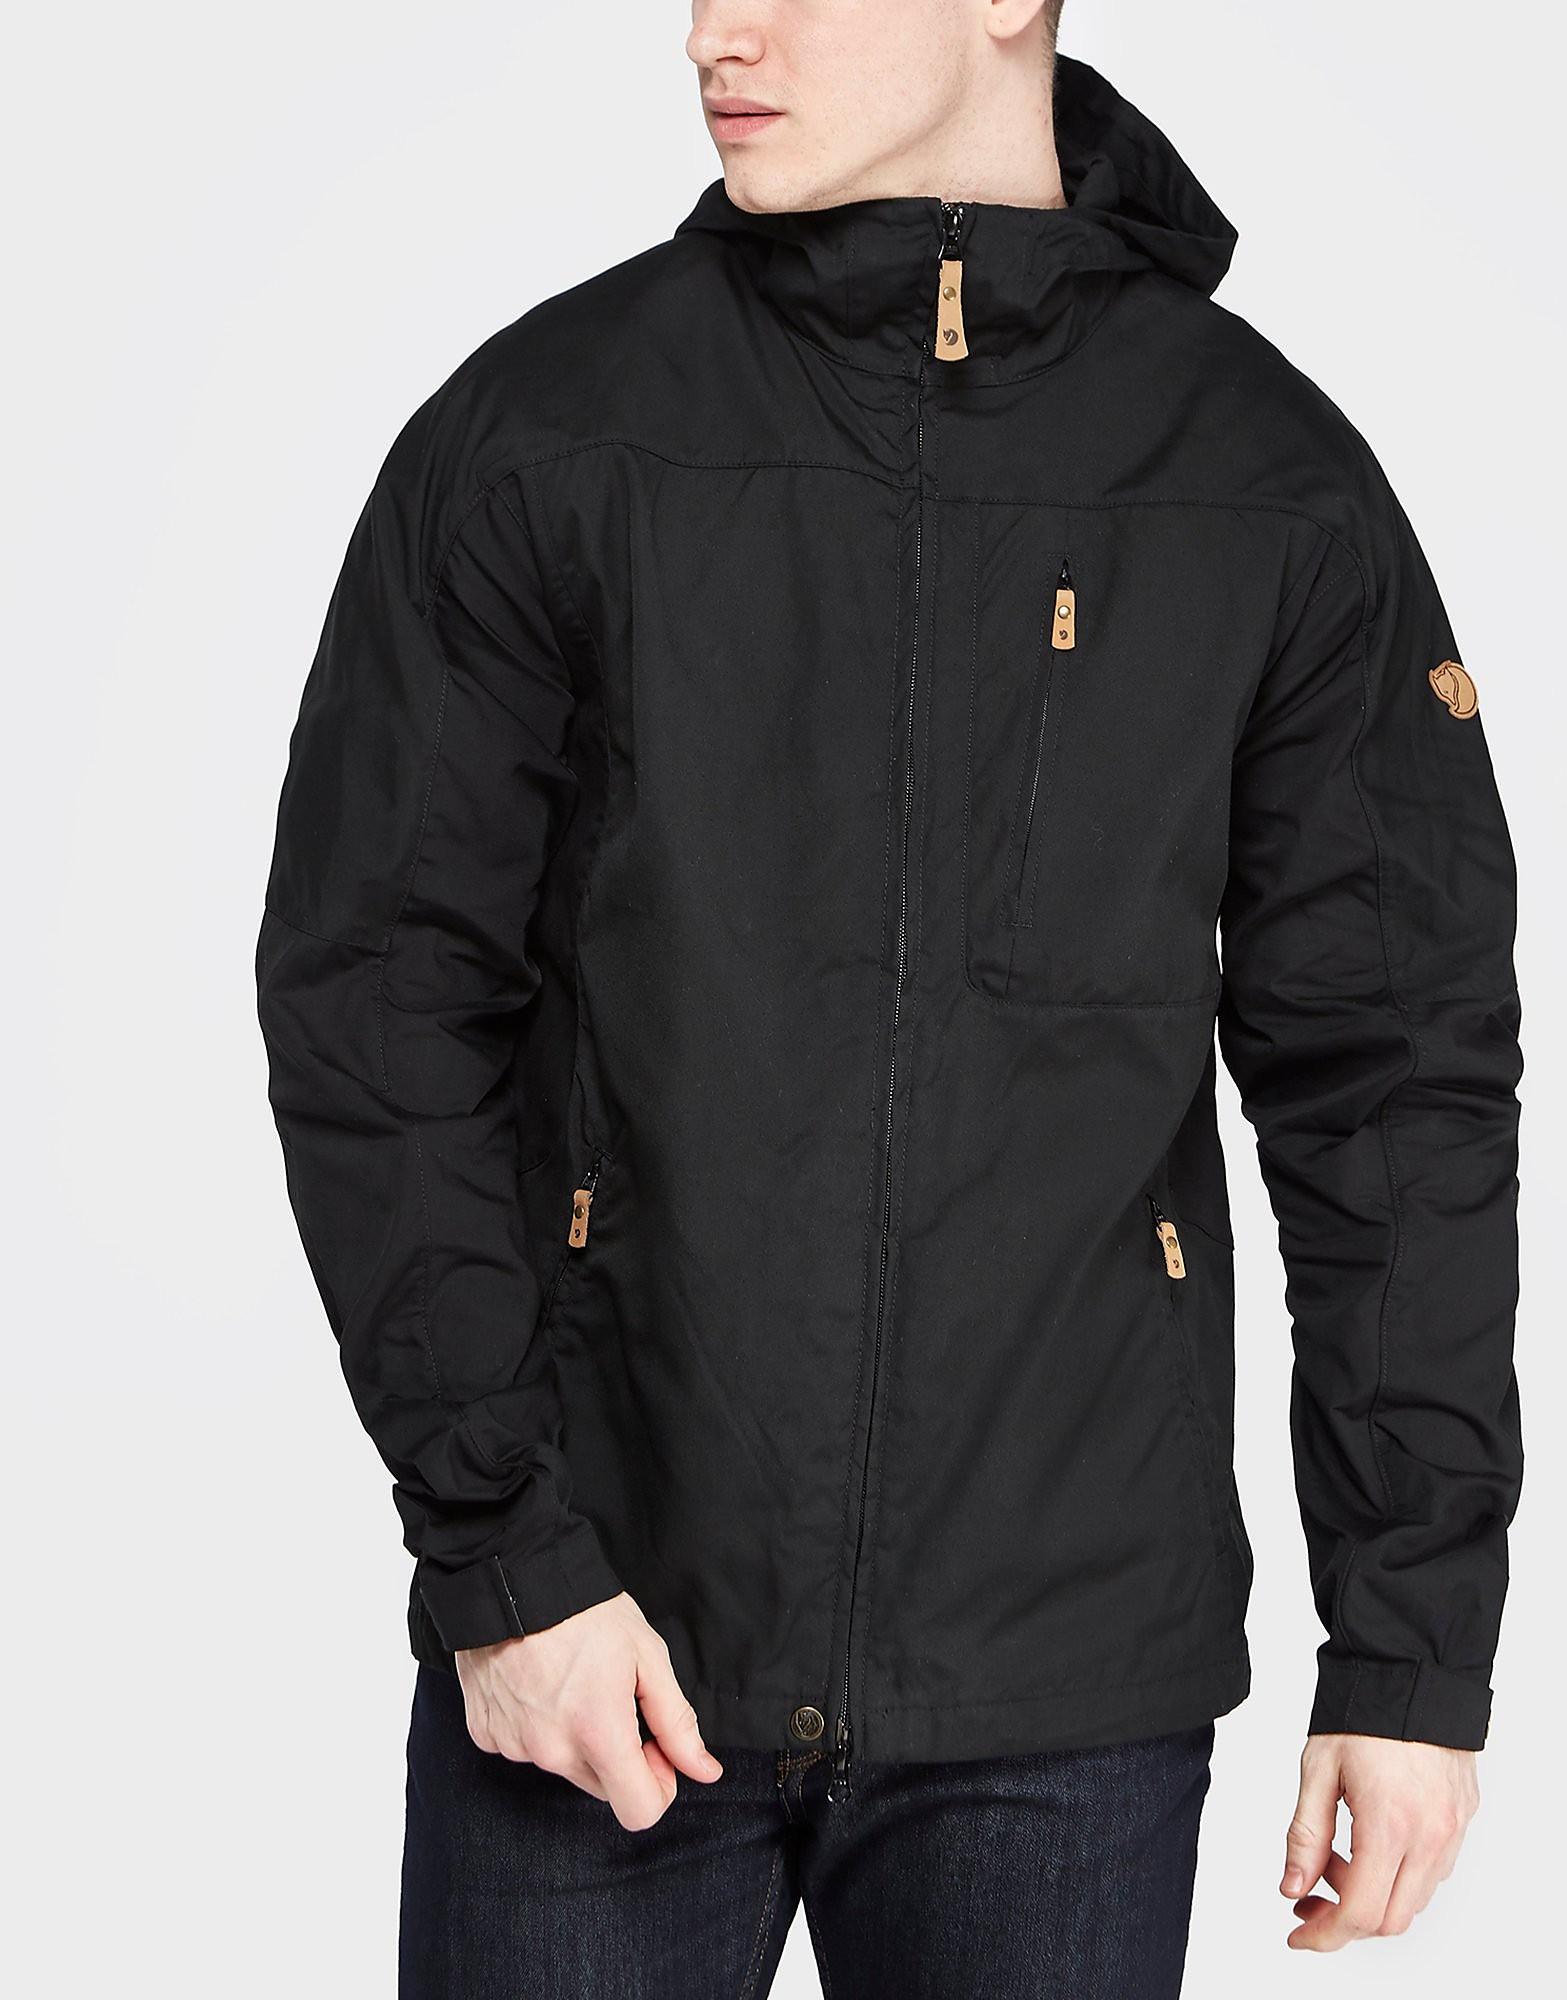 Fjallraven Sten Lightweight Jacket